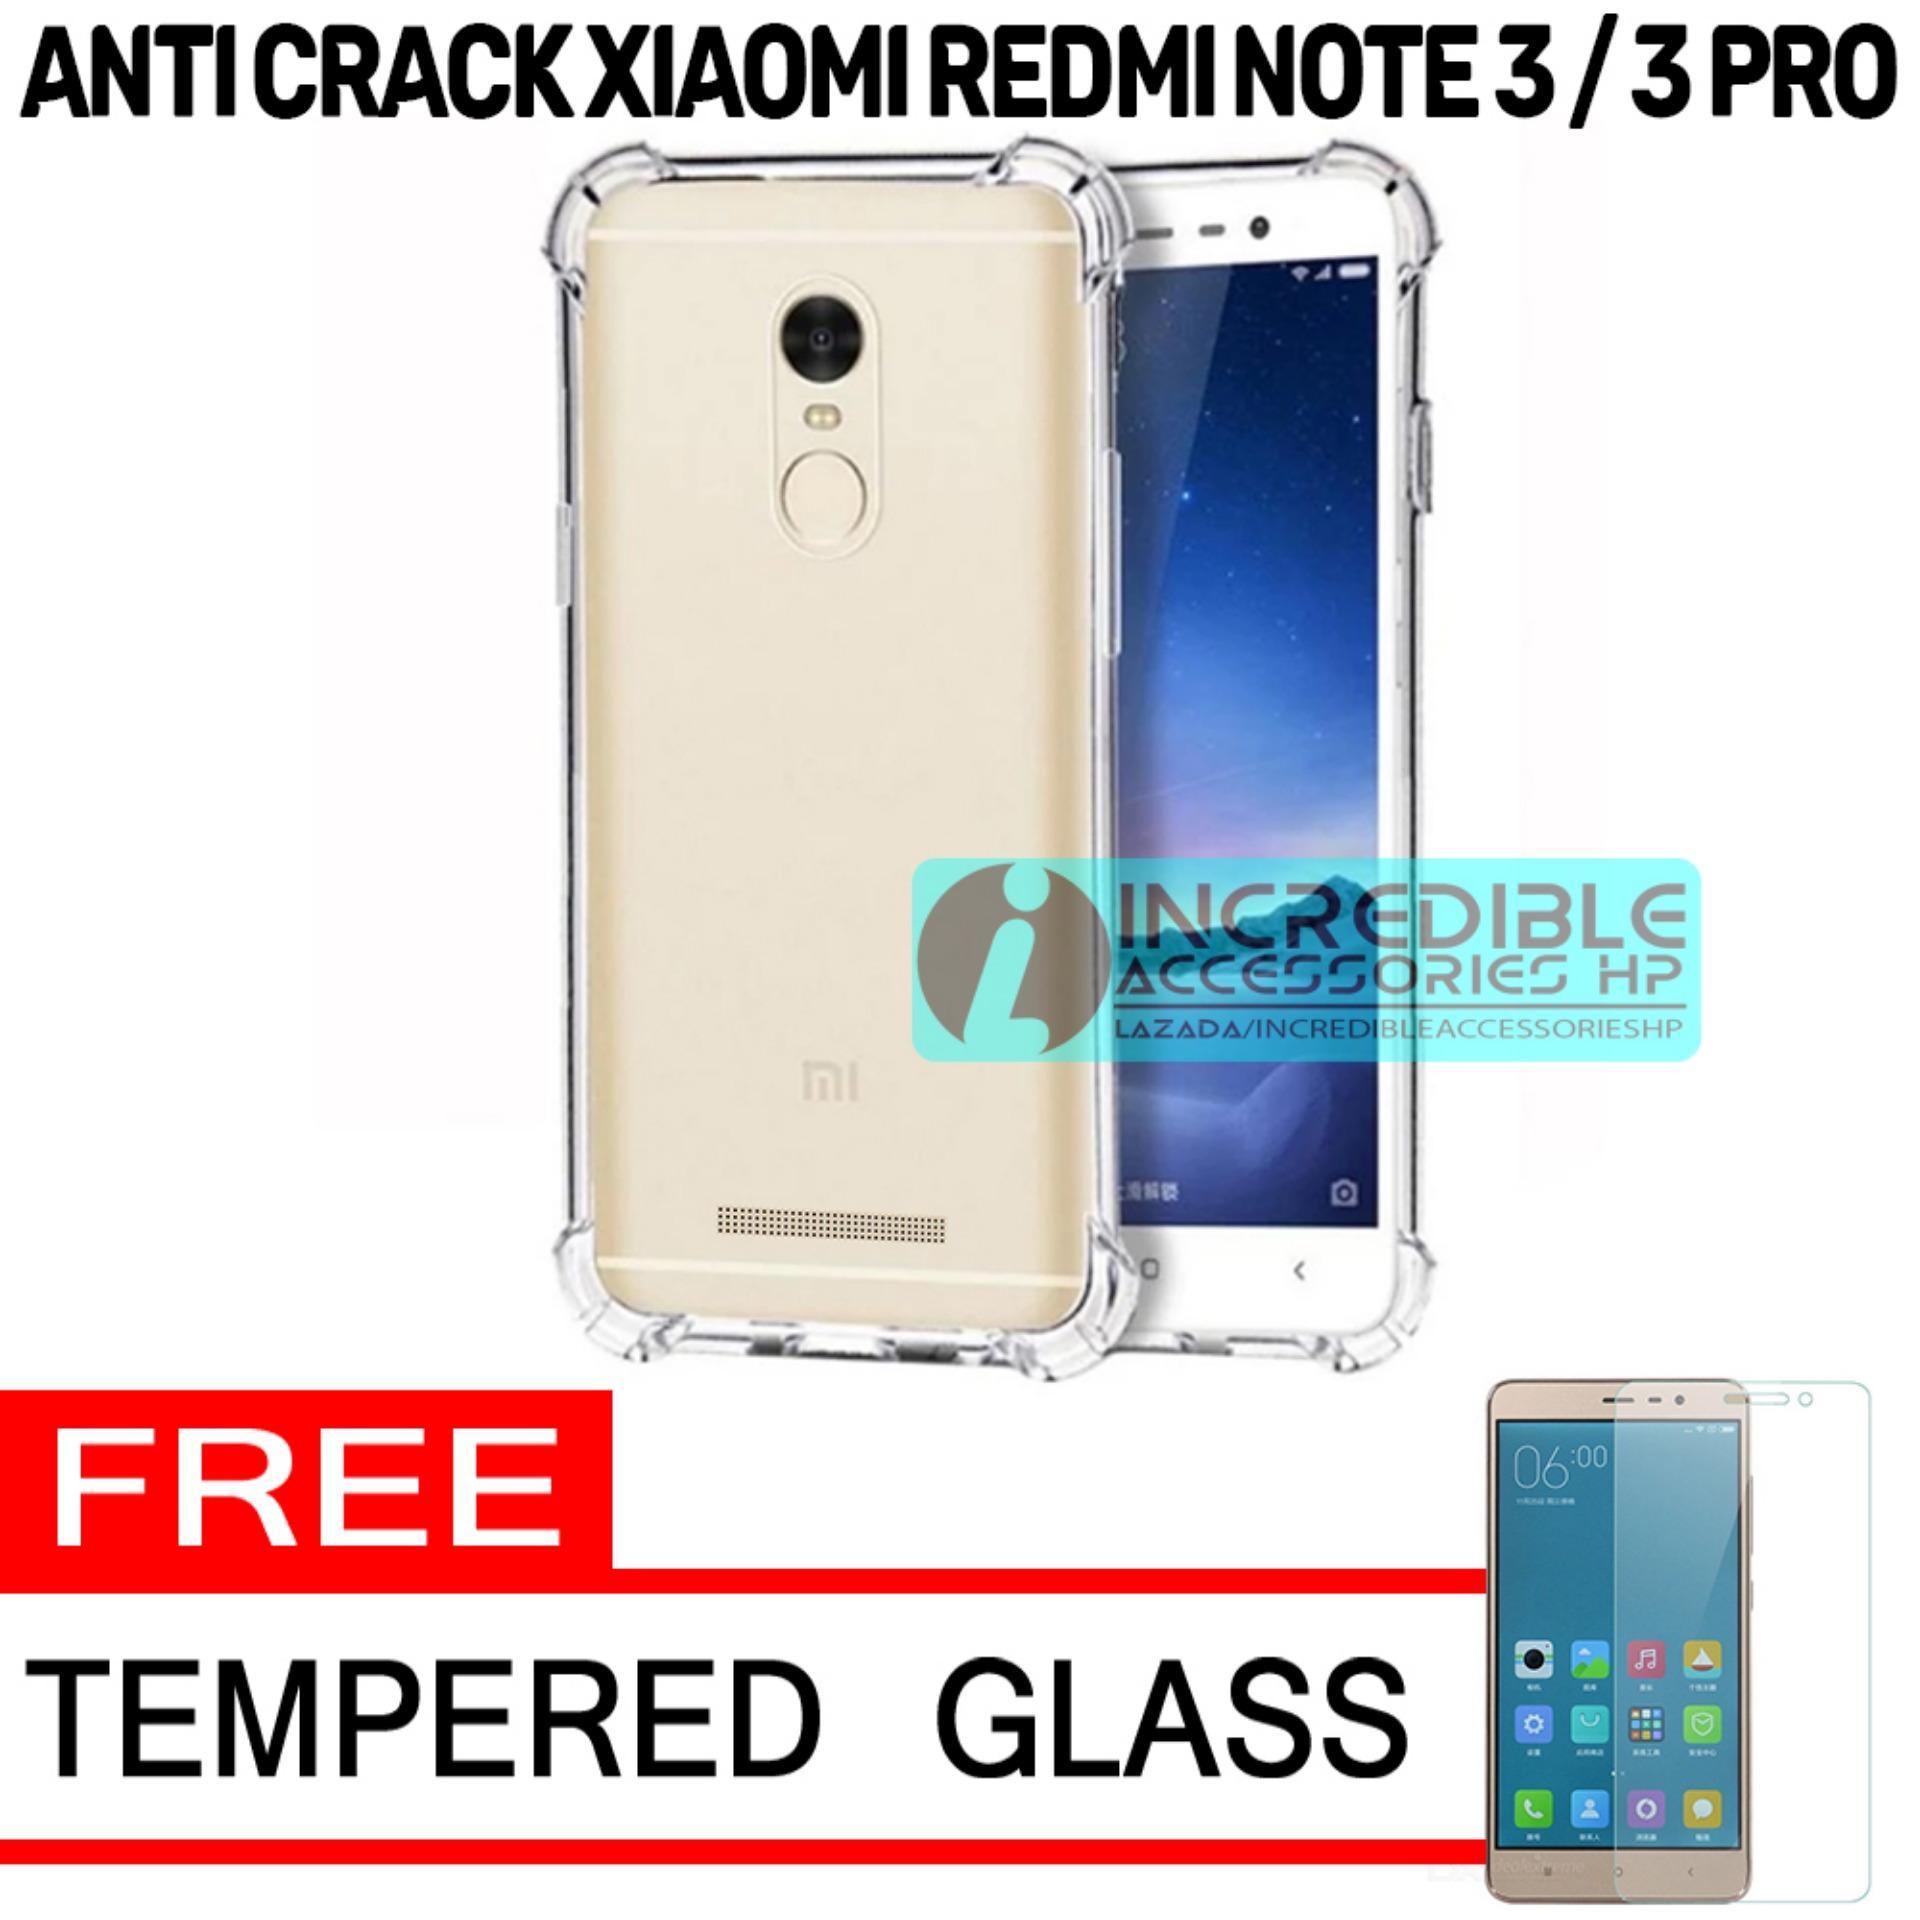 Case Anti Shock / Anti Crack Elegant Softcase  for Xiaomi Redmi Note 3 Pro - White Clear + Free Tem